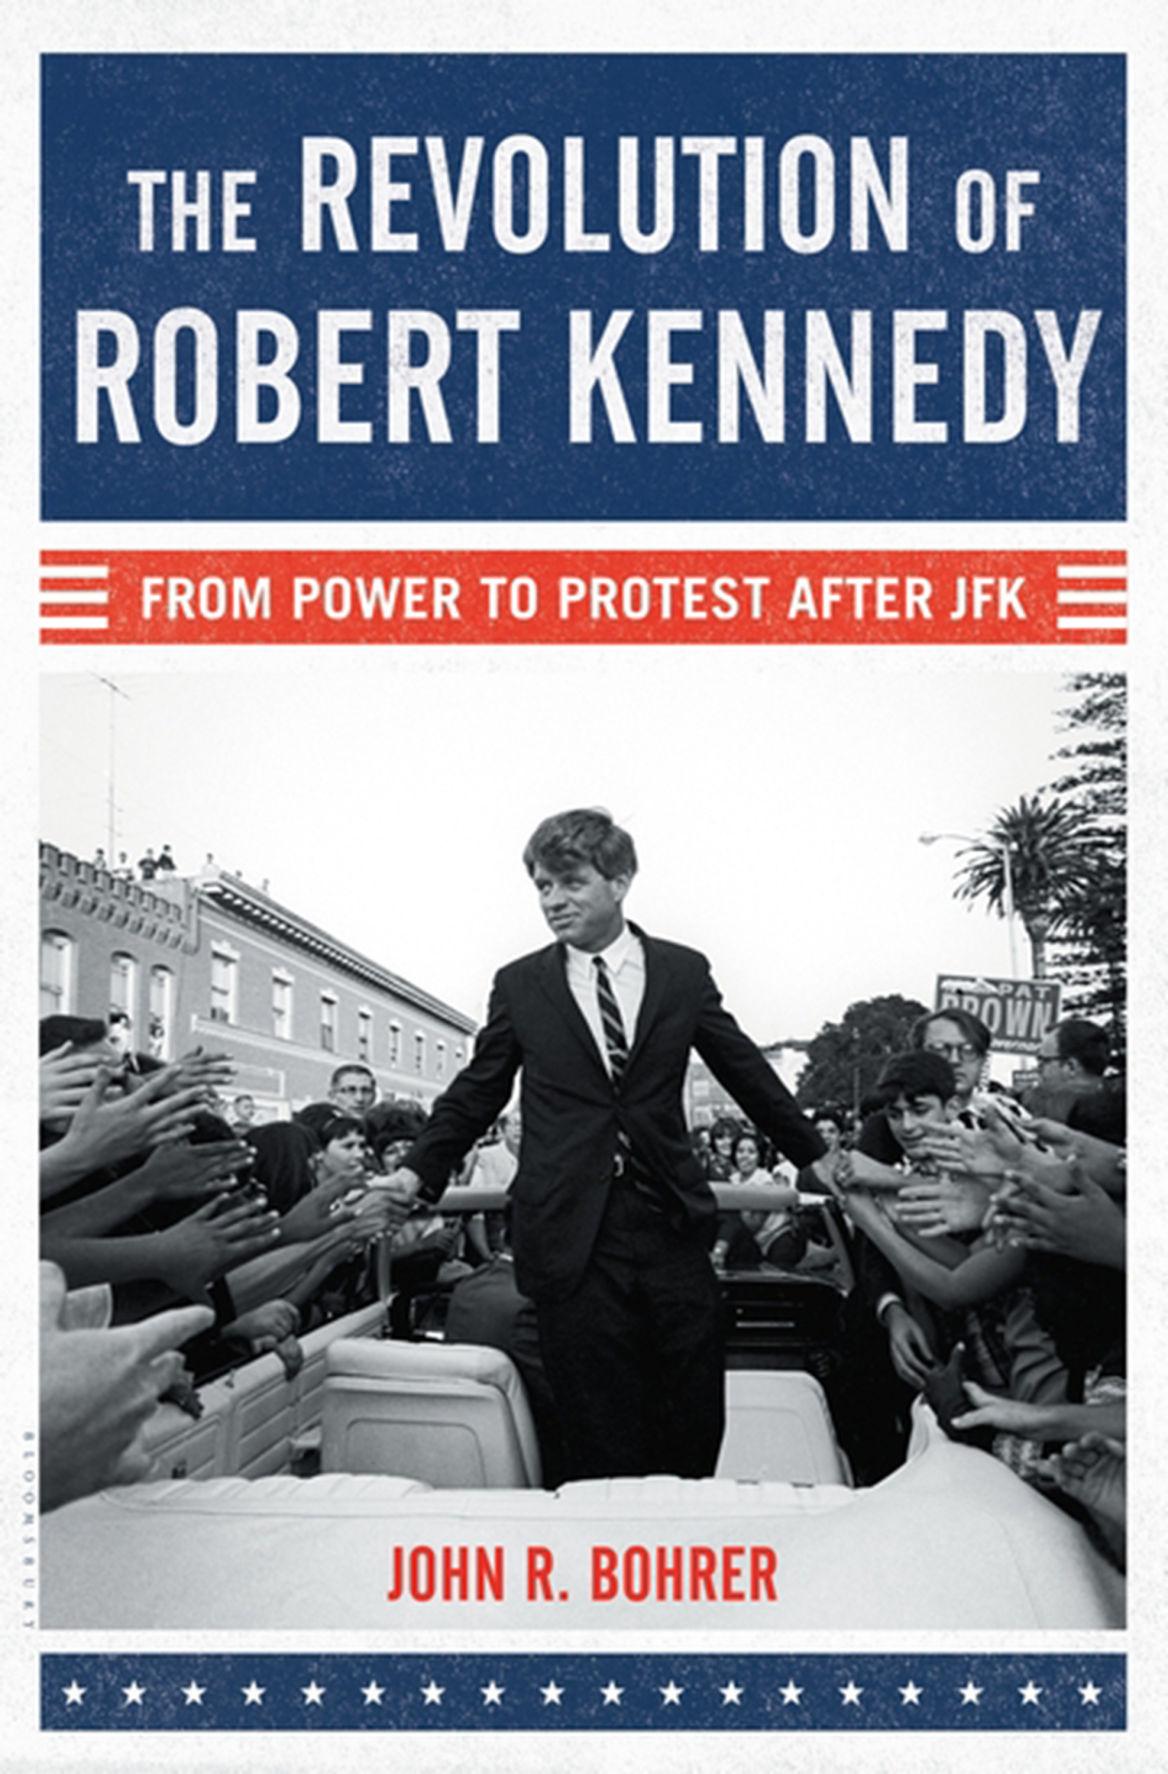 BOOKS BOOK-REVOLUTION-ROBERTKENNEDY-REVIEW PG